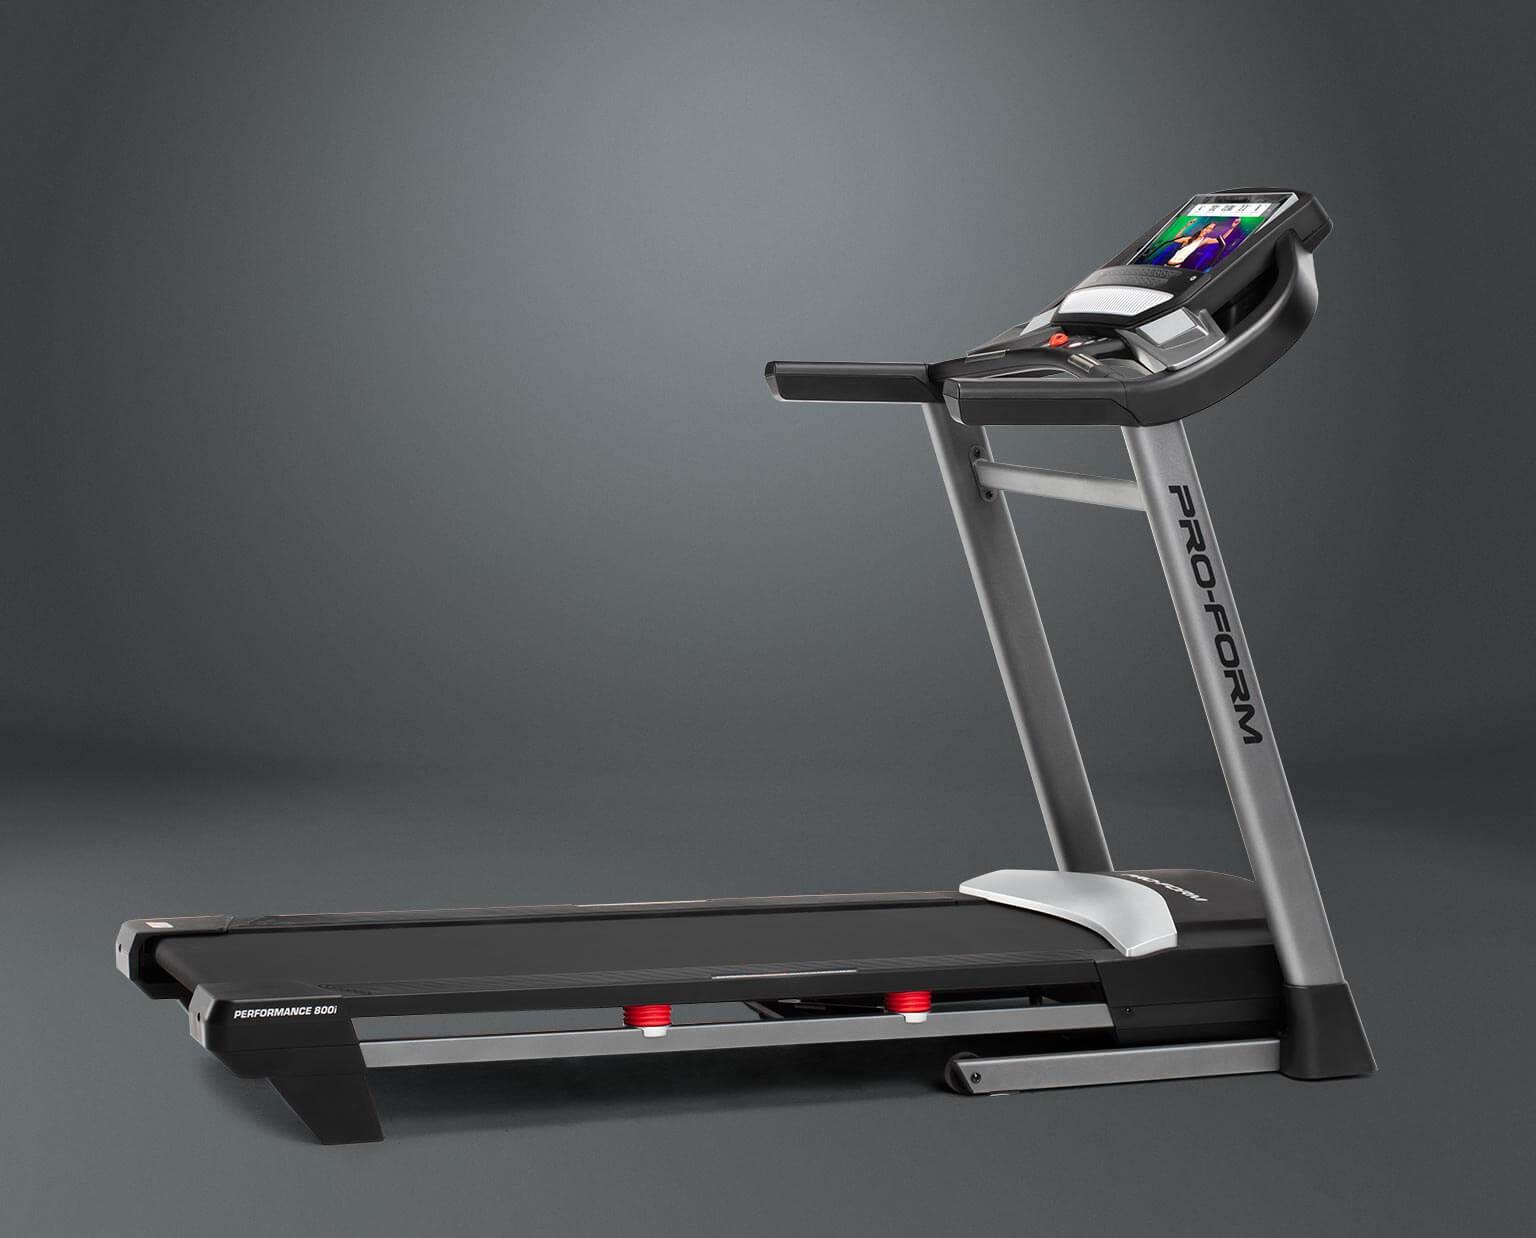 ProForm Treadmills SMART Performance 800i  gallery image 4